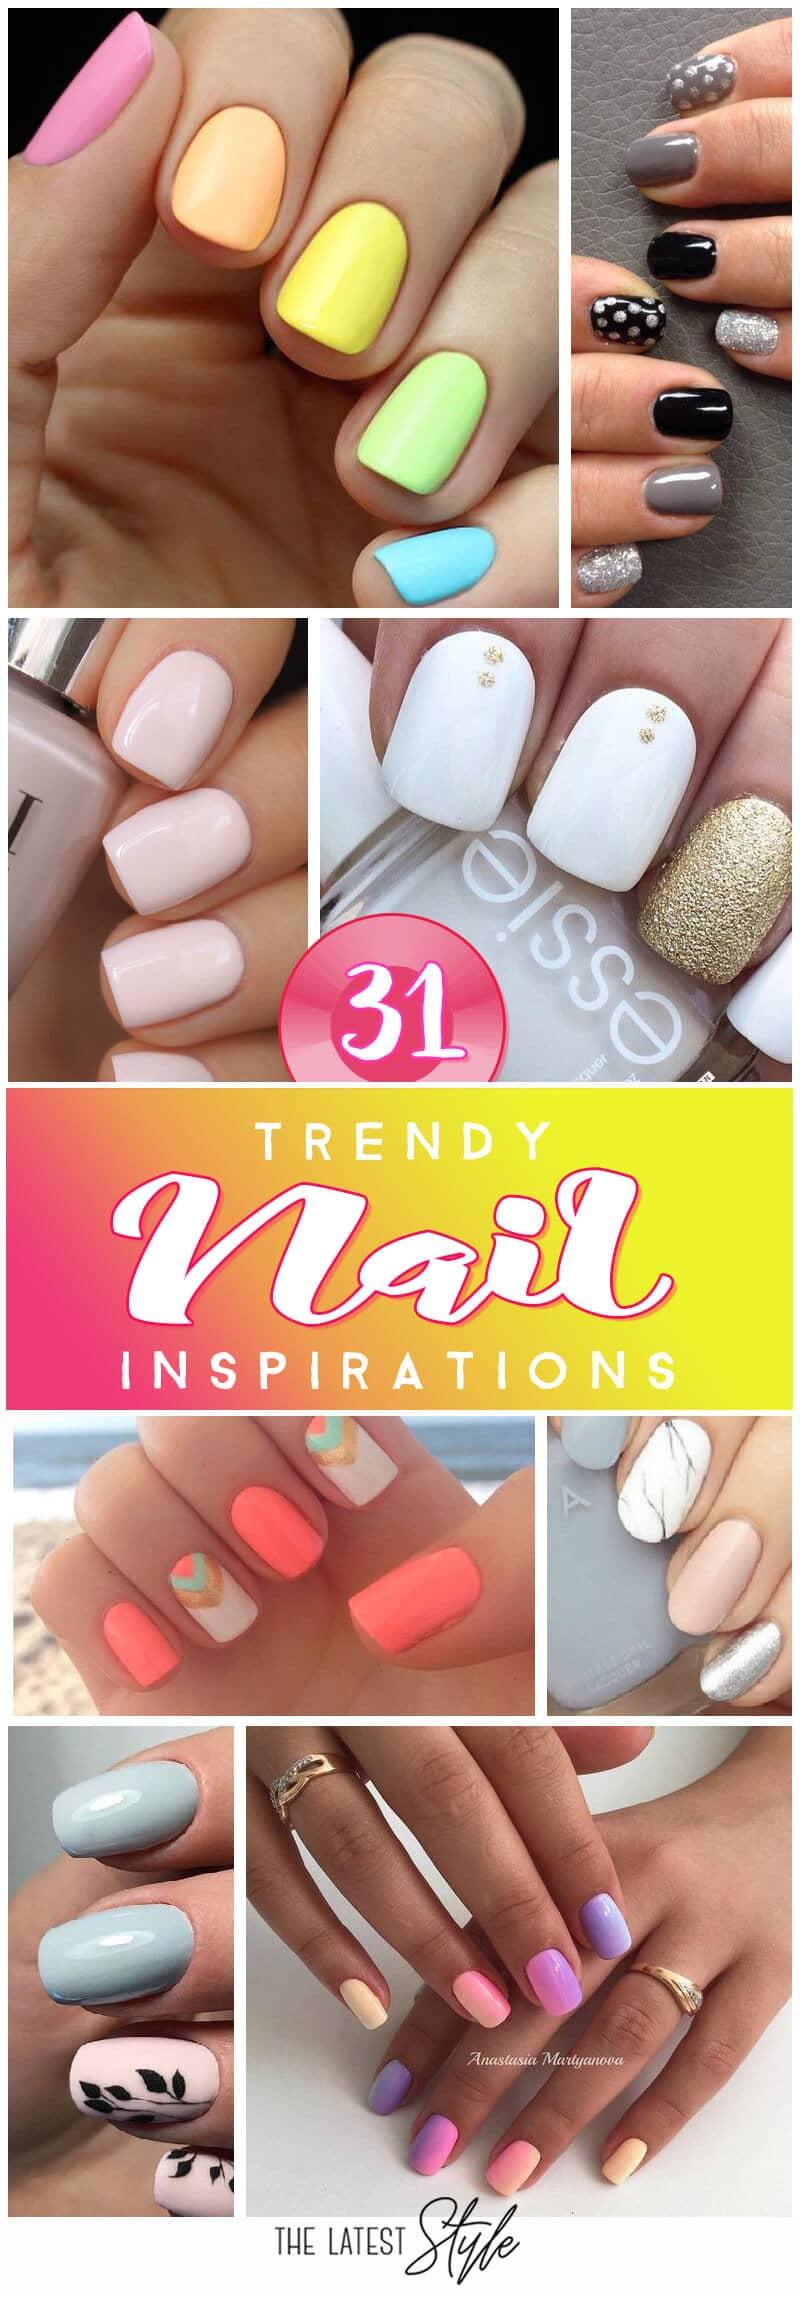 31 Super Trendy Nail Inspirations